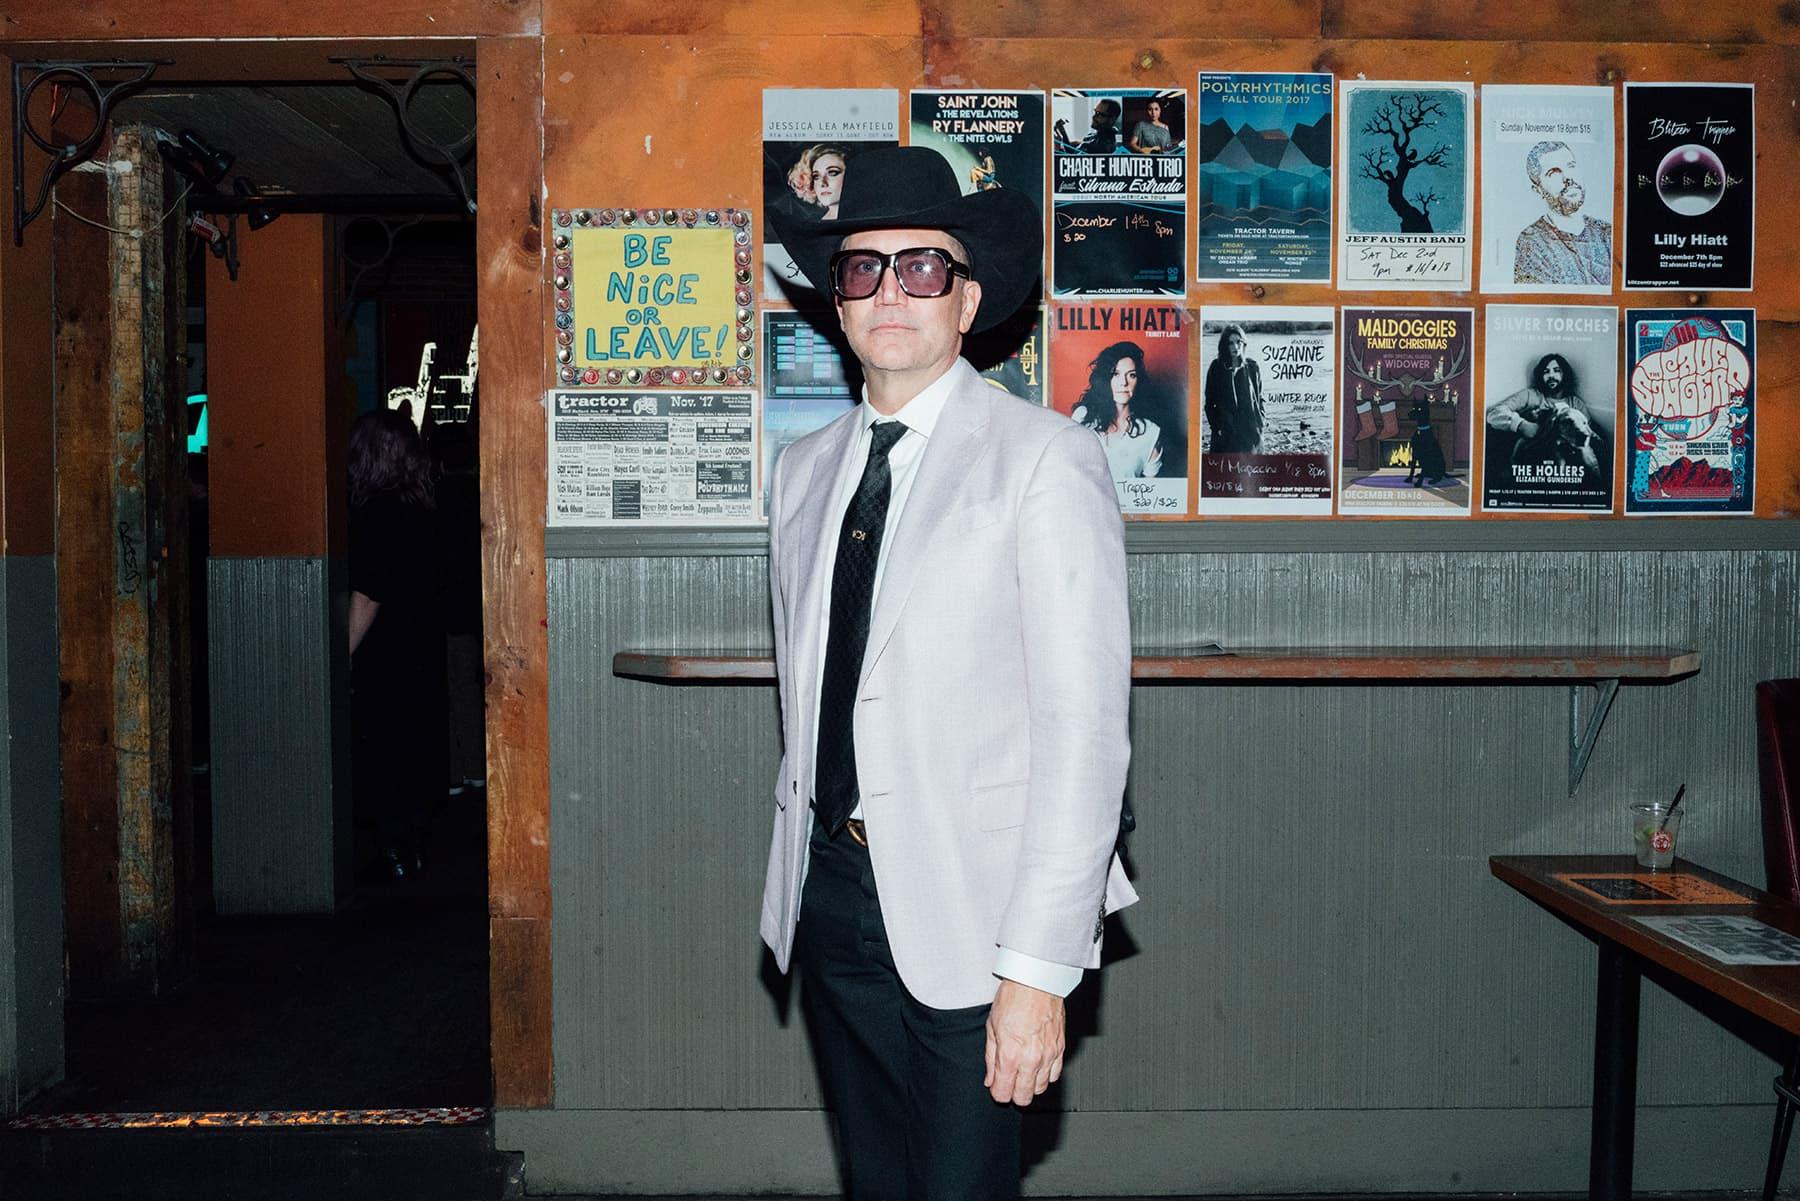 Brent Amaker– Photo by Ben Lindbloom